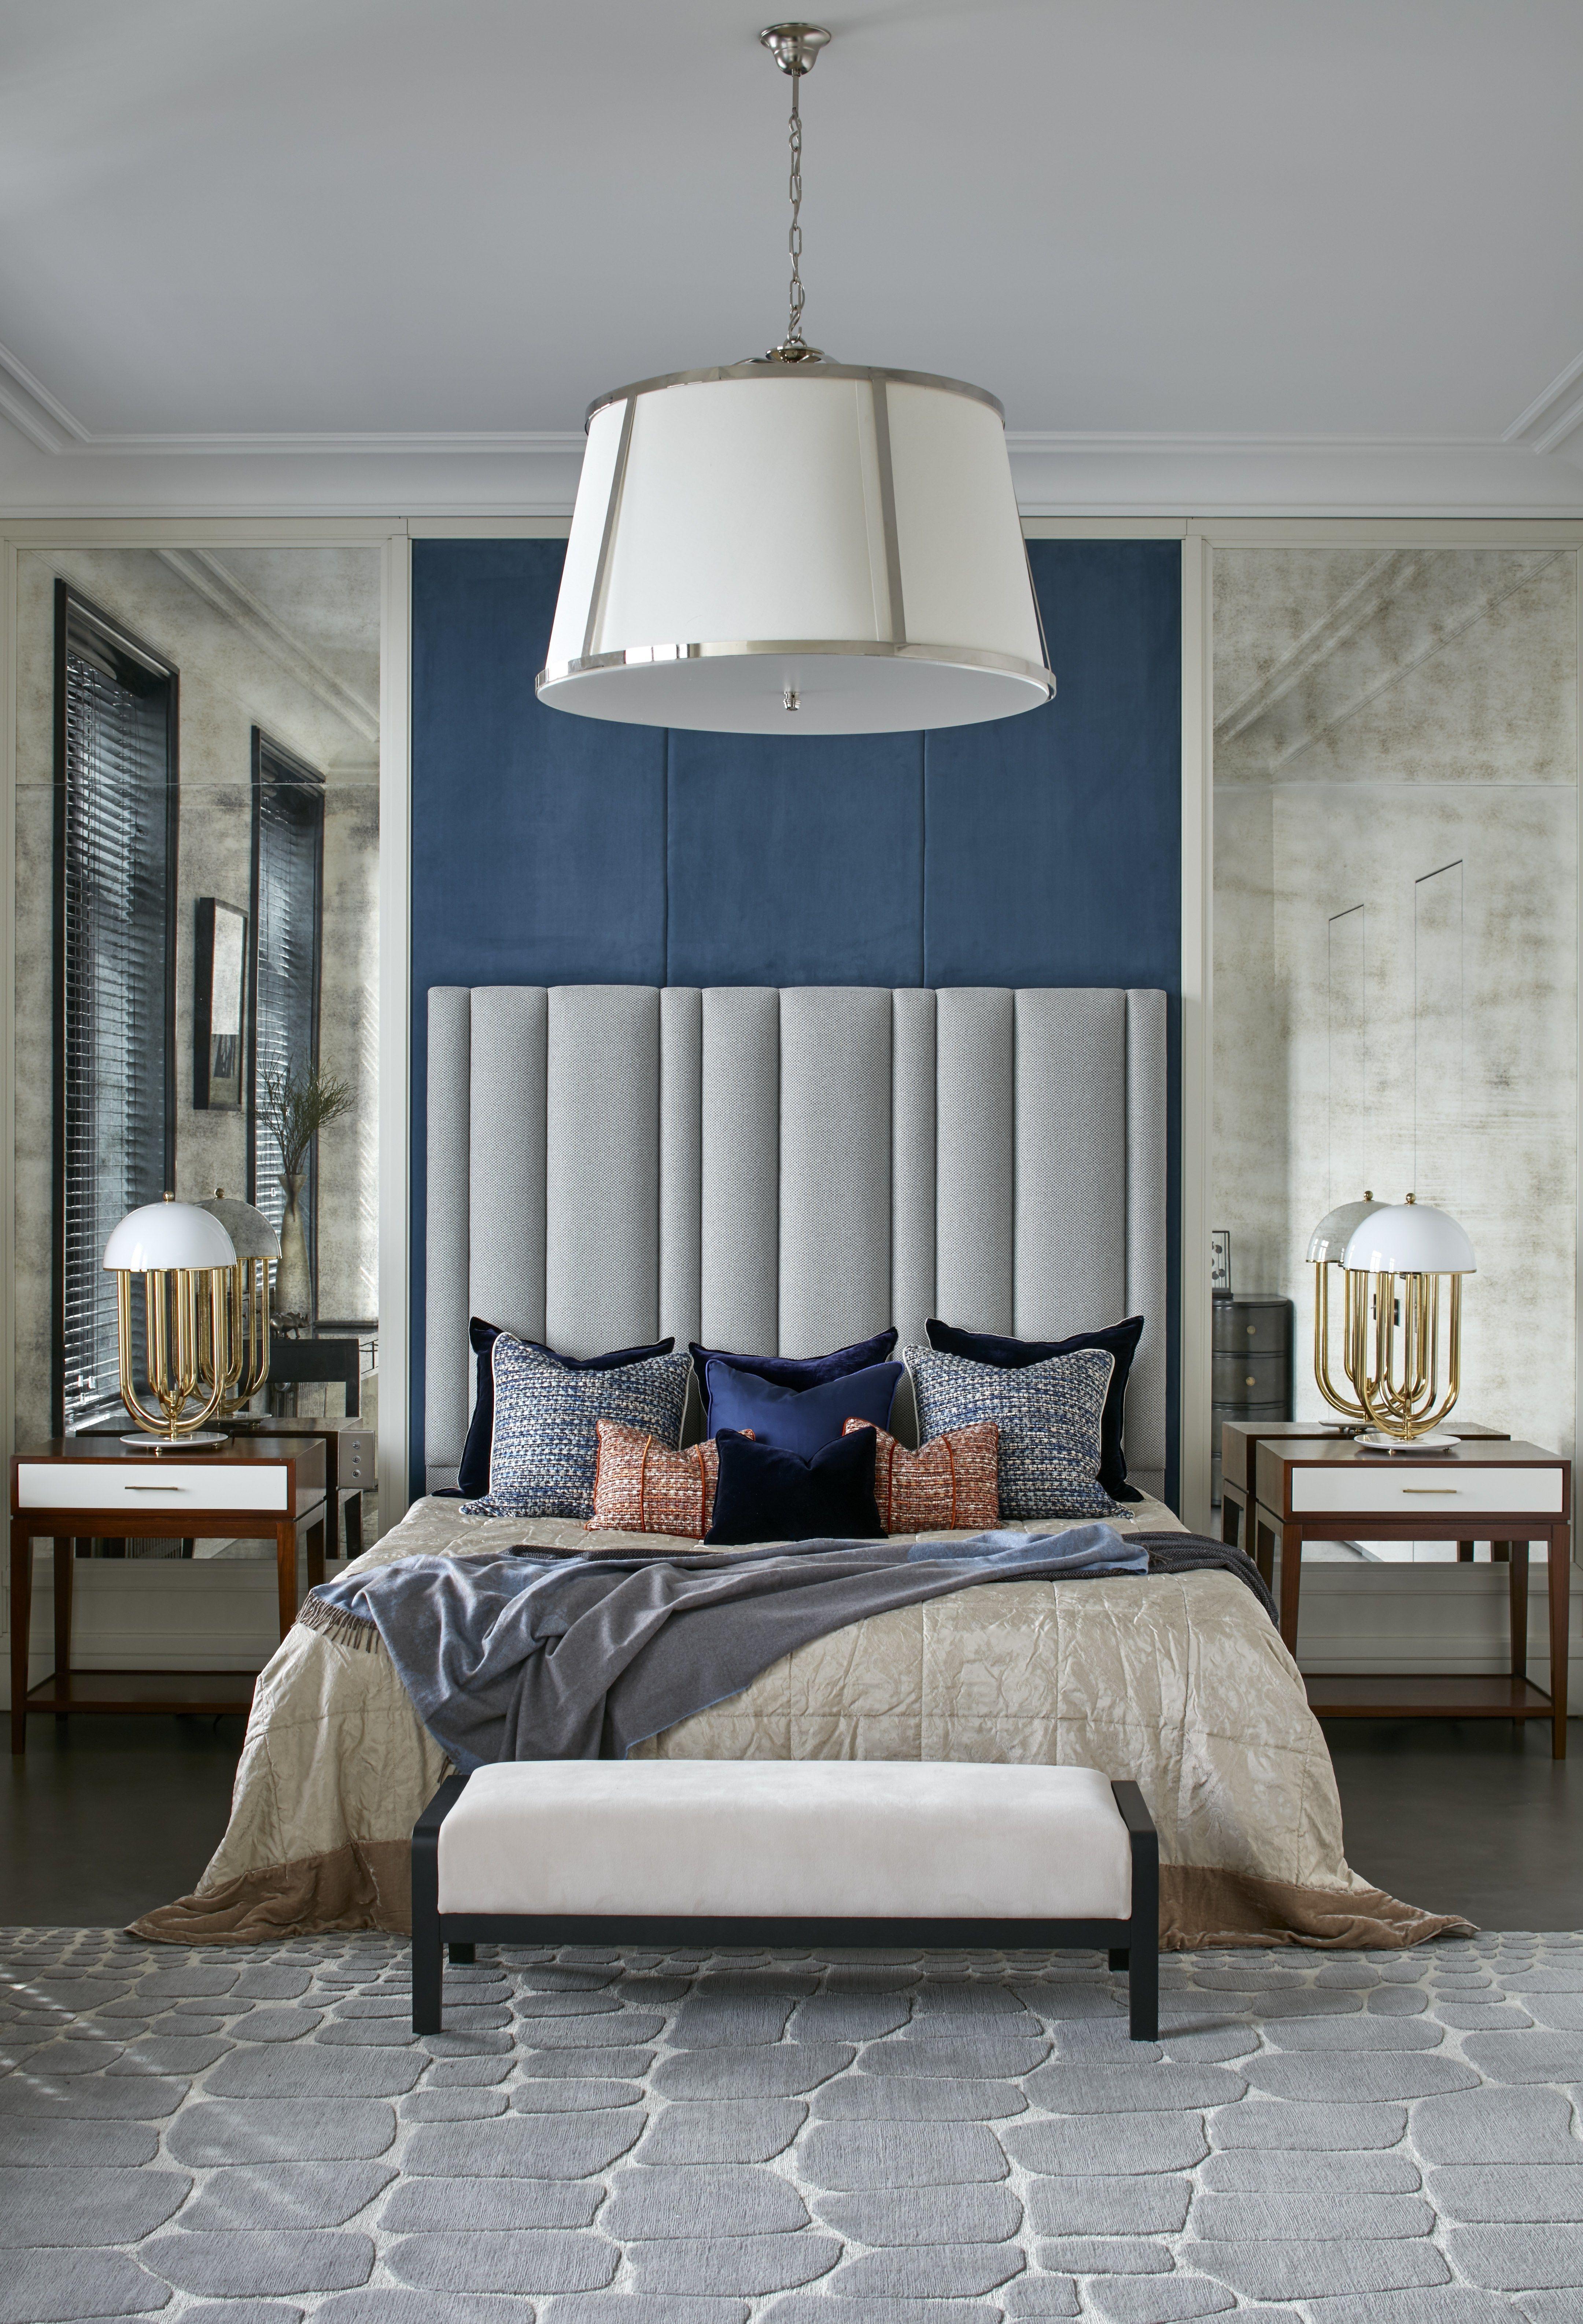 4 room master bedroom design  Top Designers Share Their Master Bedroom Interior Design Ideas